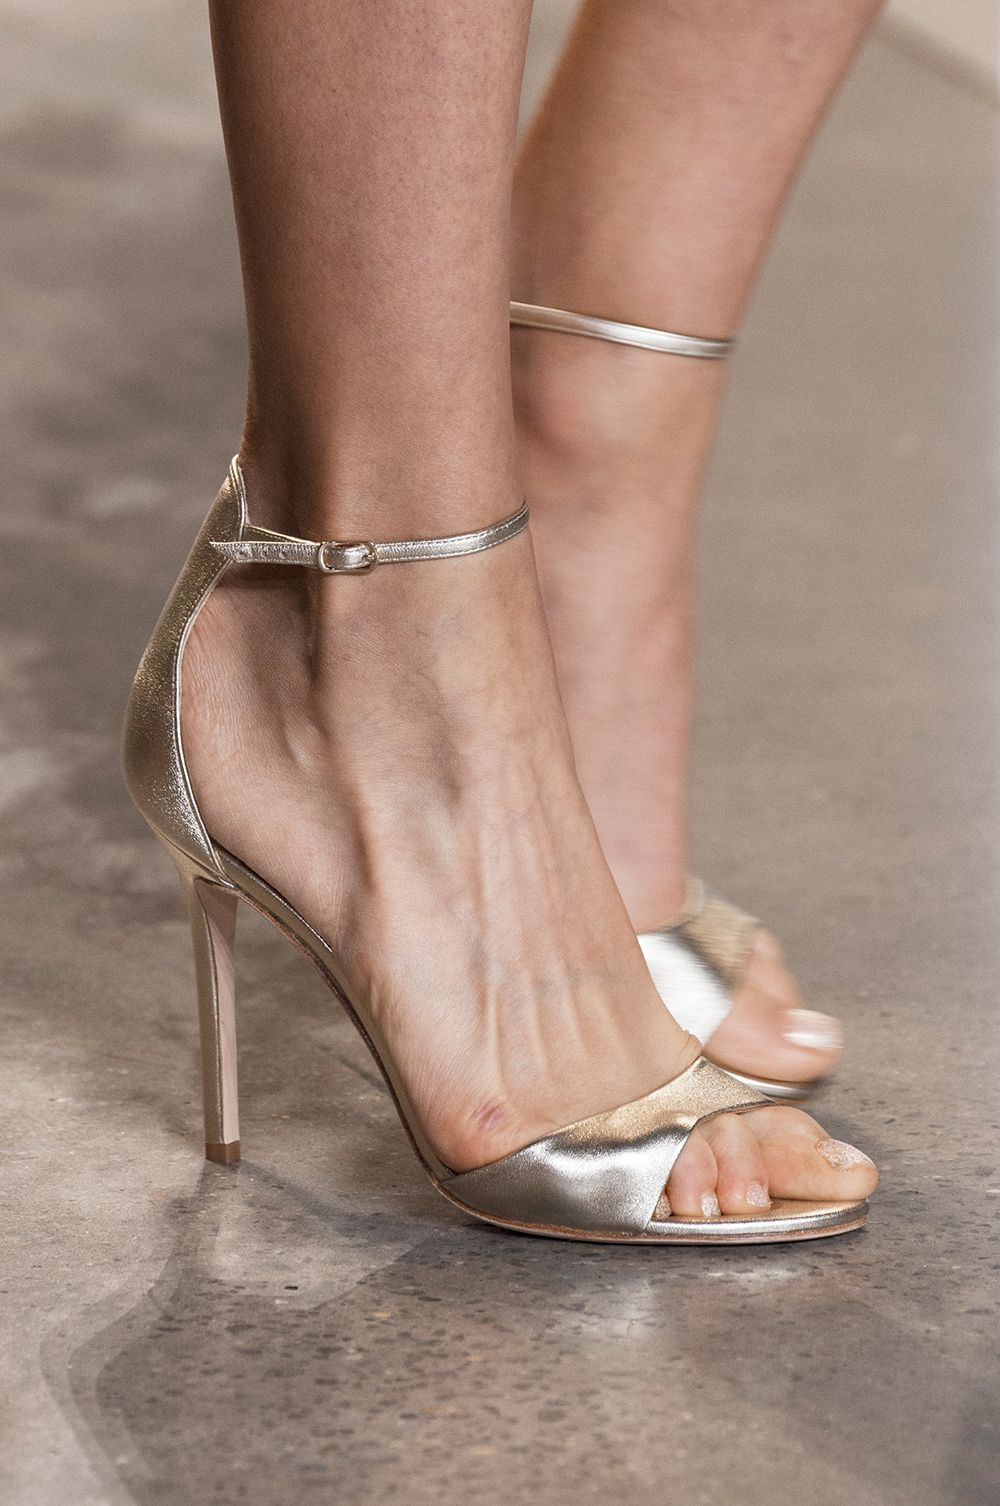 Avviso a tutte le shoes lovers  le nuove scarpe da tenere d occhio ... 73876501c44